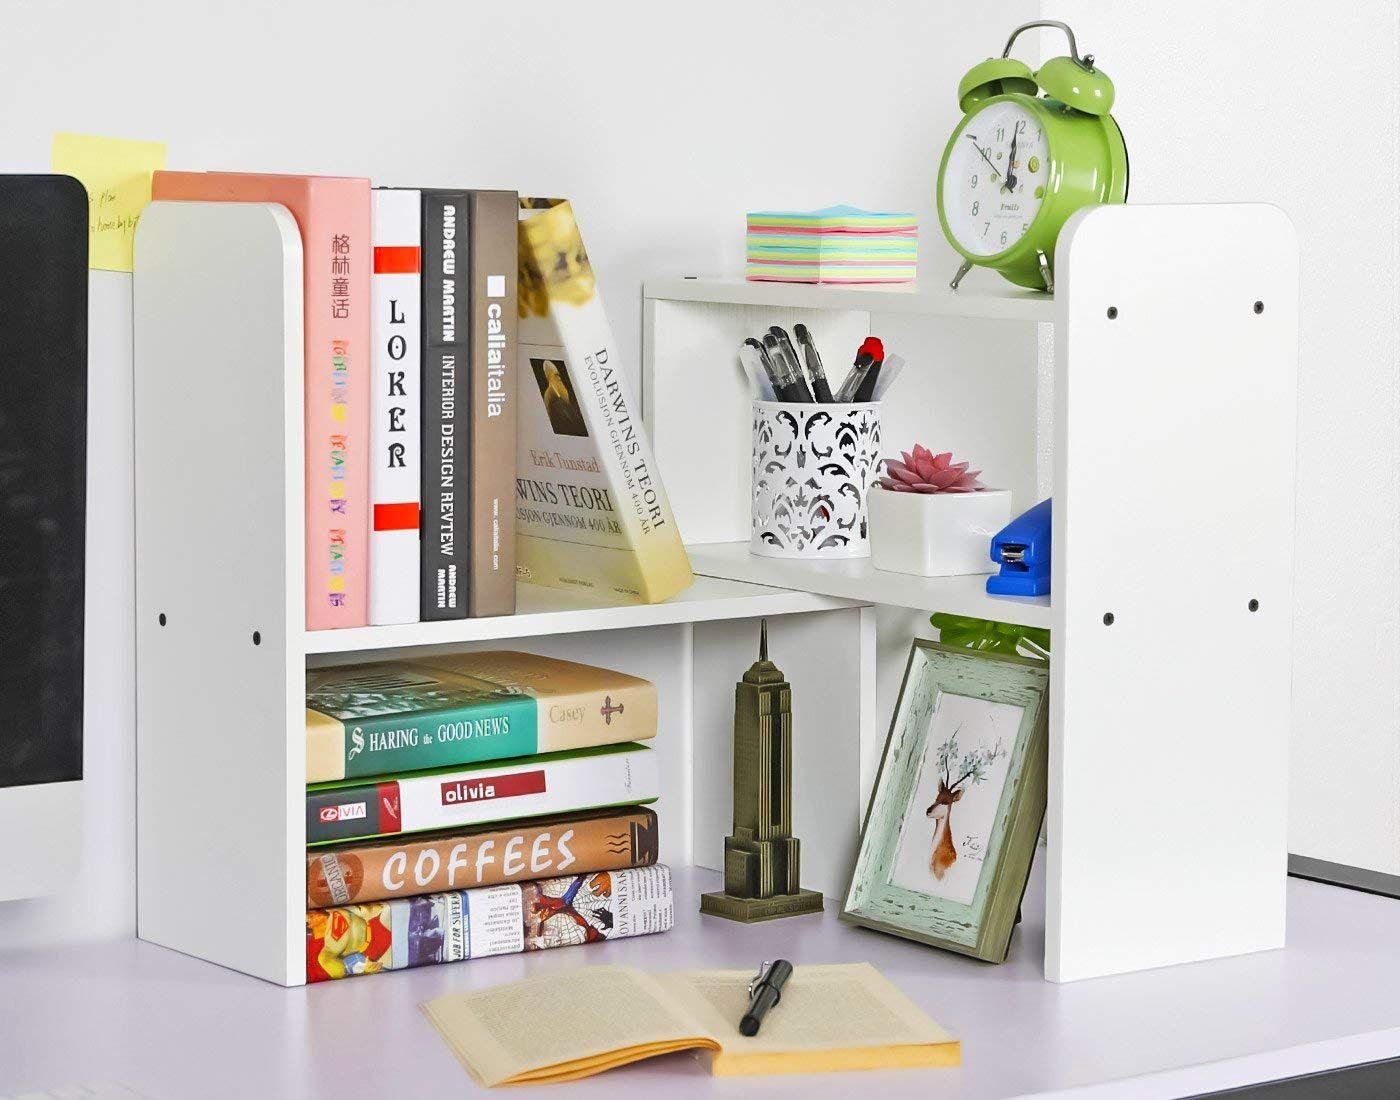 Desktop Bookshelf Adjustable Countertop Bookcase Office Supplies Wood Desk Organizer Accessor Desktop Bookshelf Office Supplies Wood Office Supply Organization